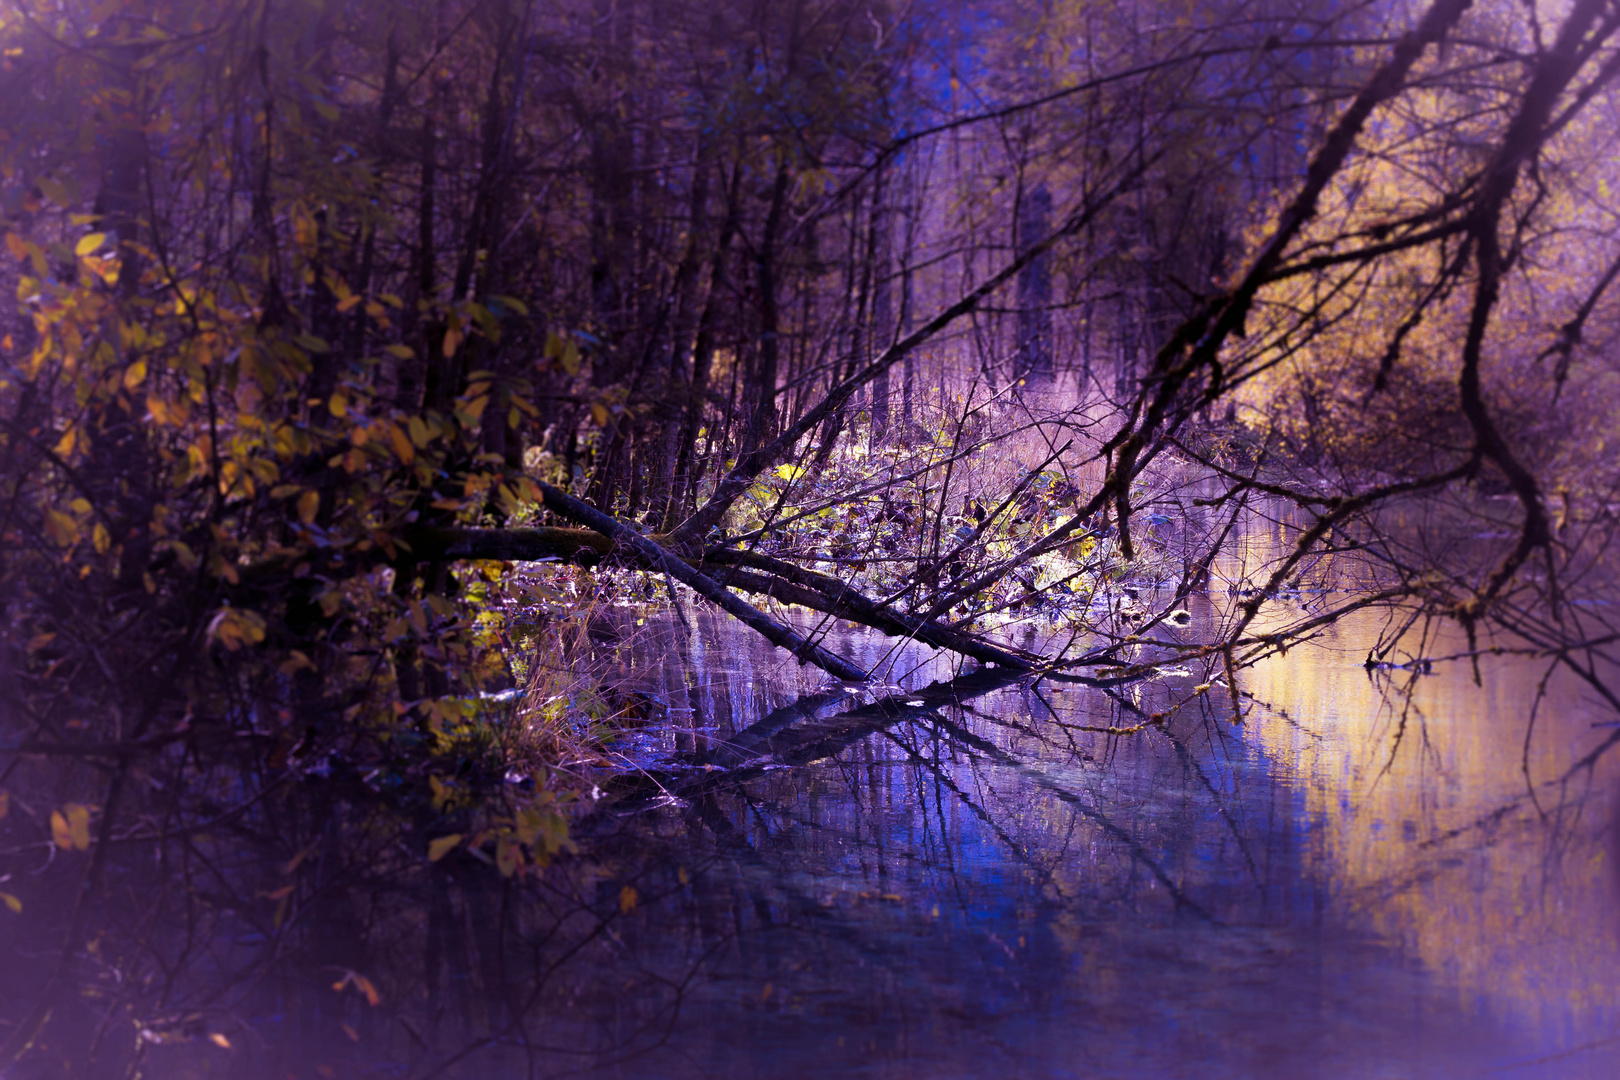 surreal nature